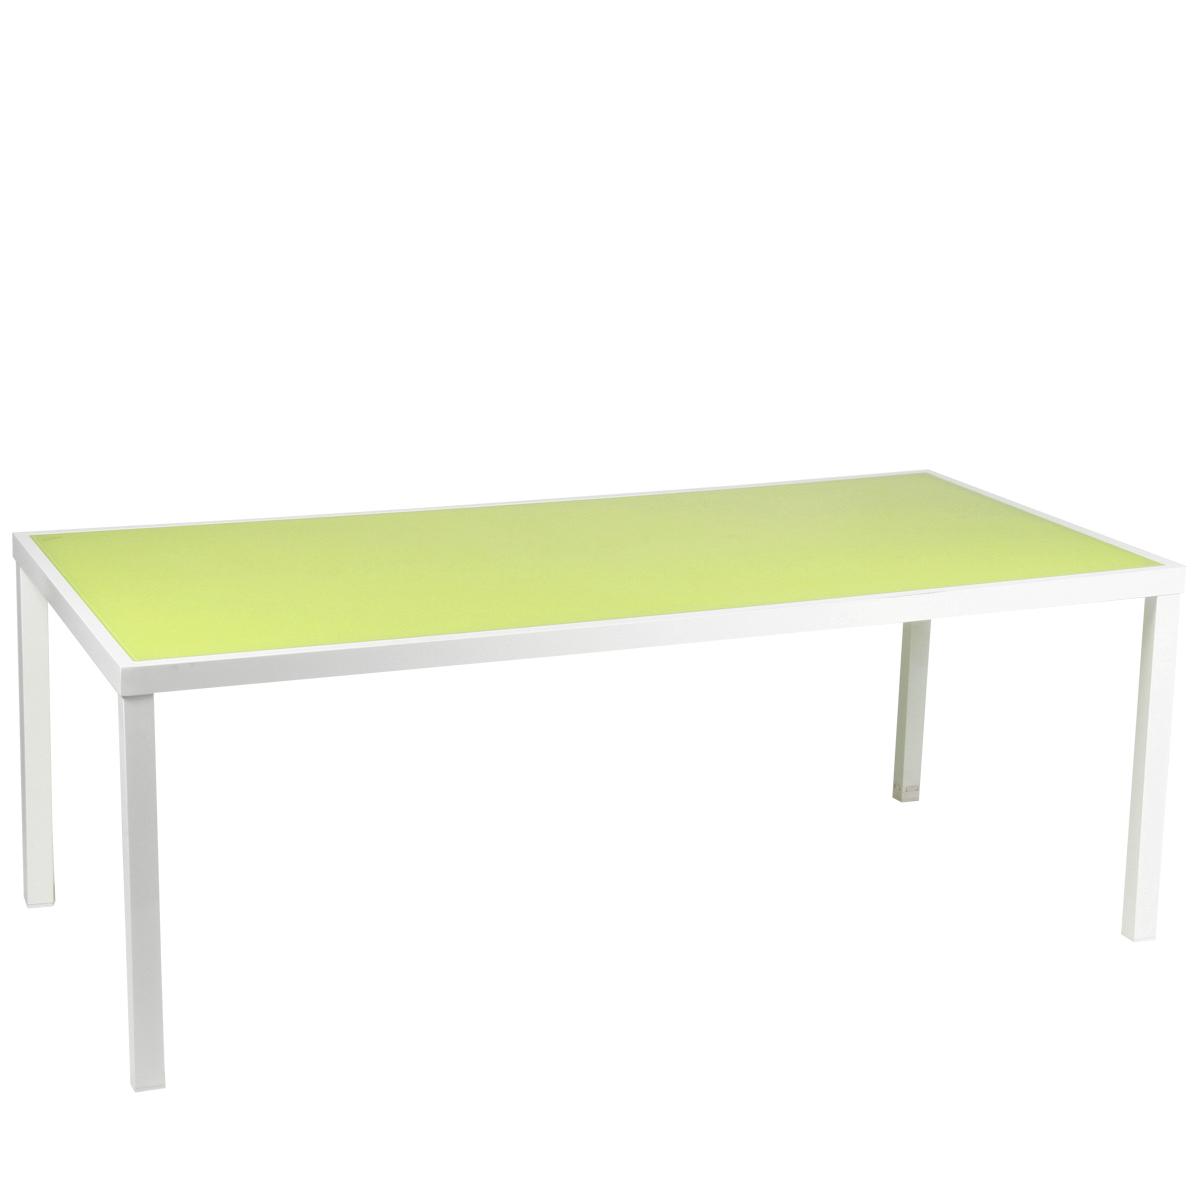 table stockholm dim 210 x 100 cm aluminum blanc plateau en verre vert jardin. Black Bedroom Furniture Sets. Home Design Ideas